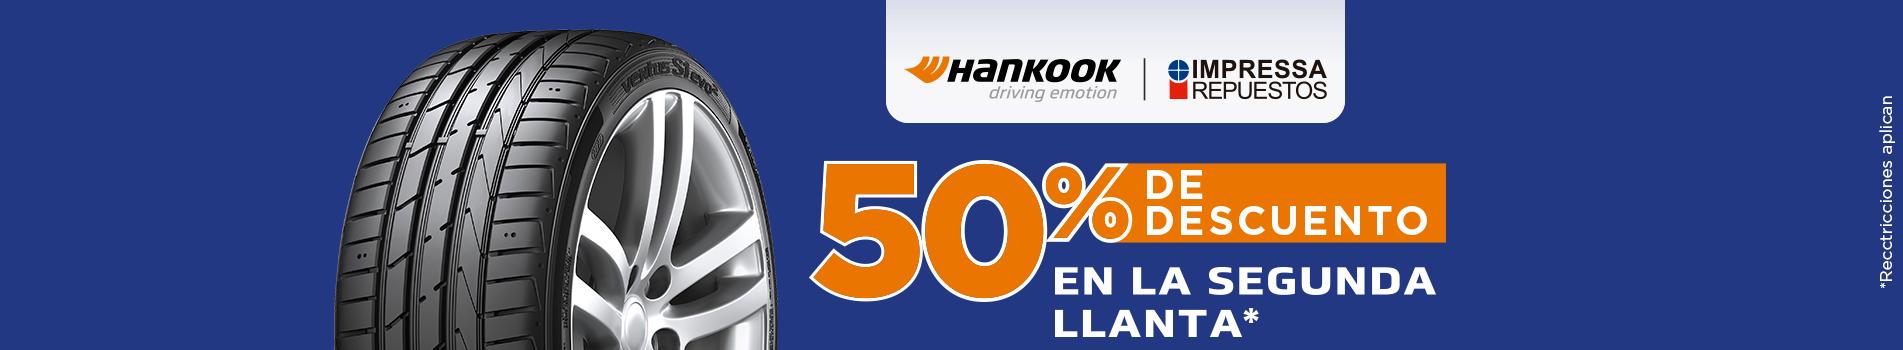 hankook-IR